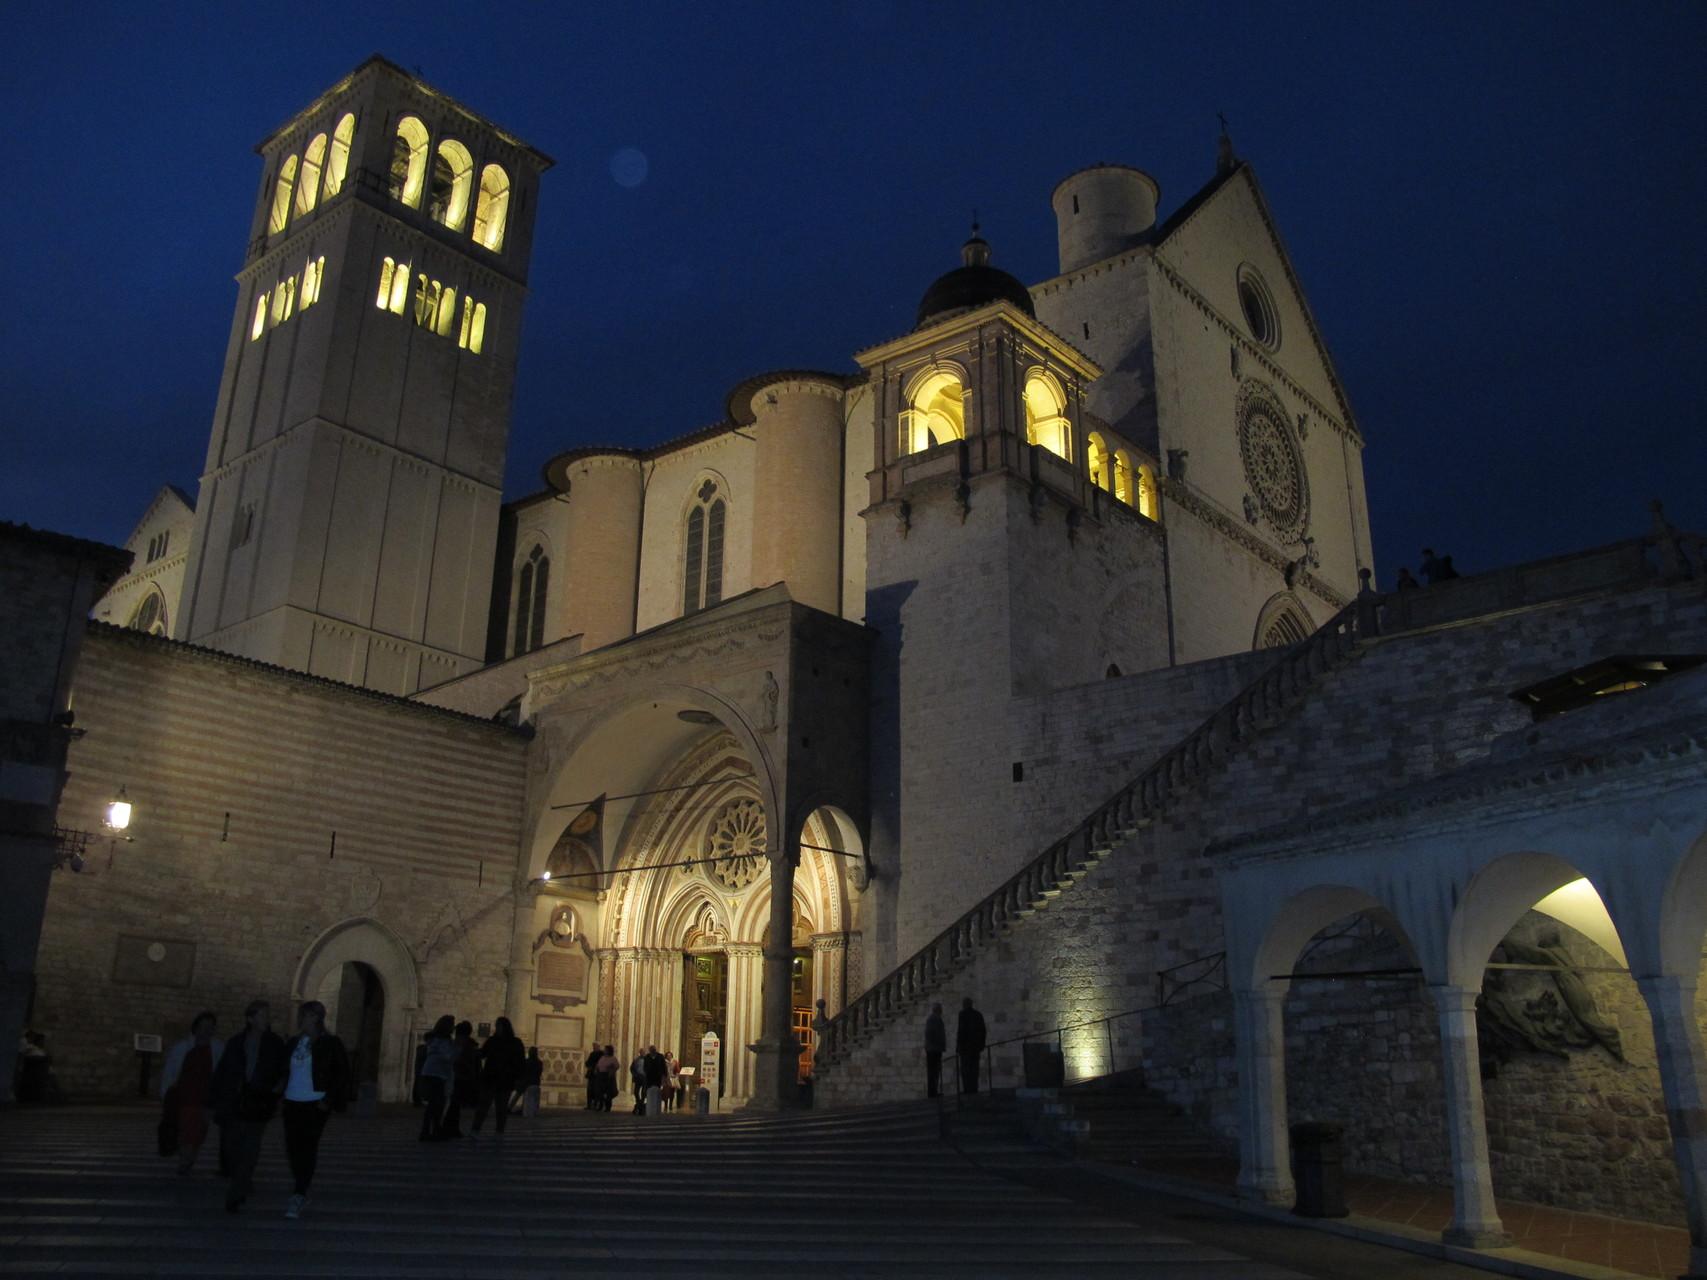 Pellegrinaggio Assisi - Cascia